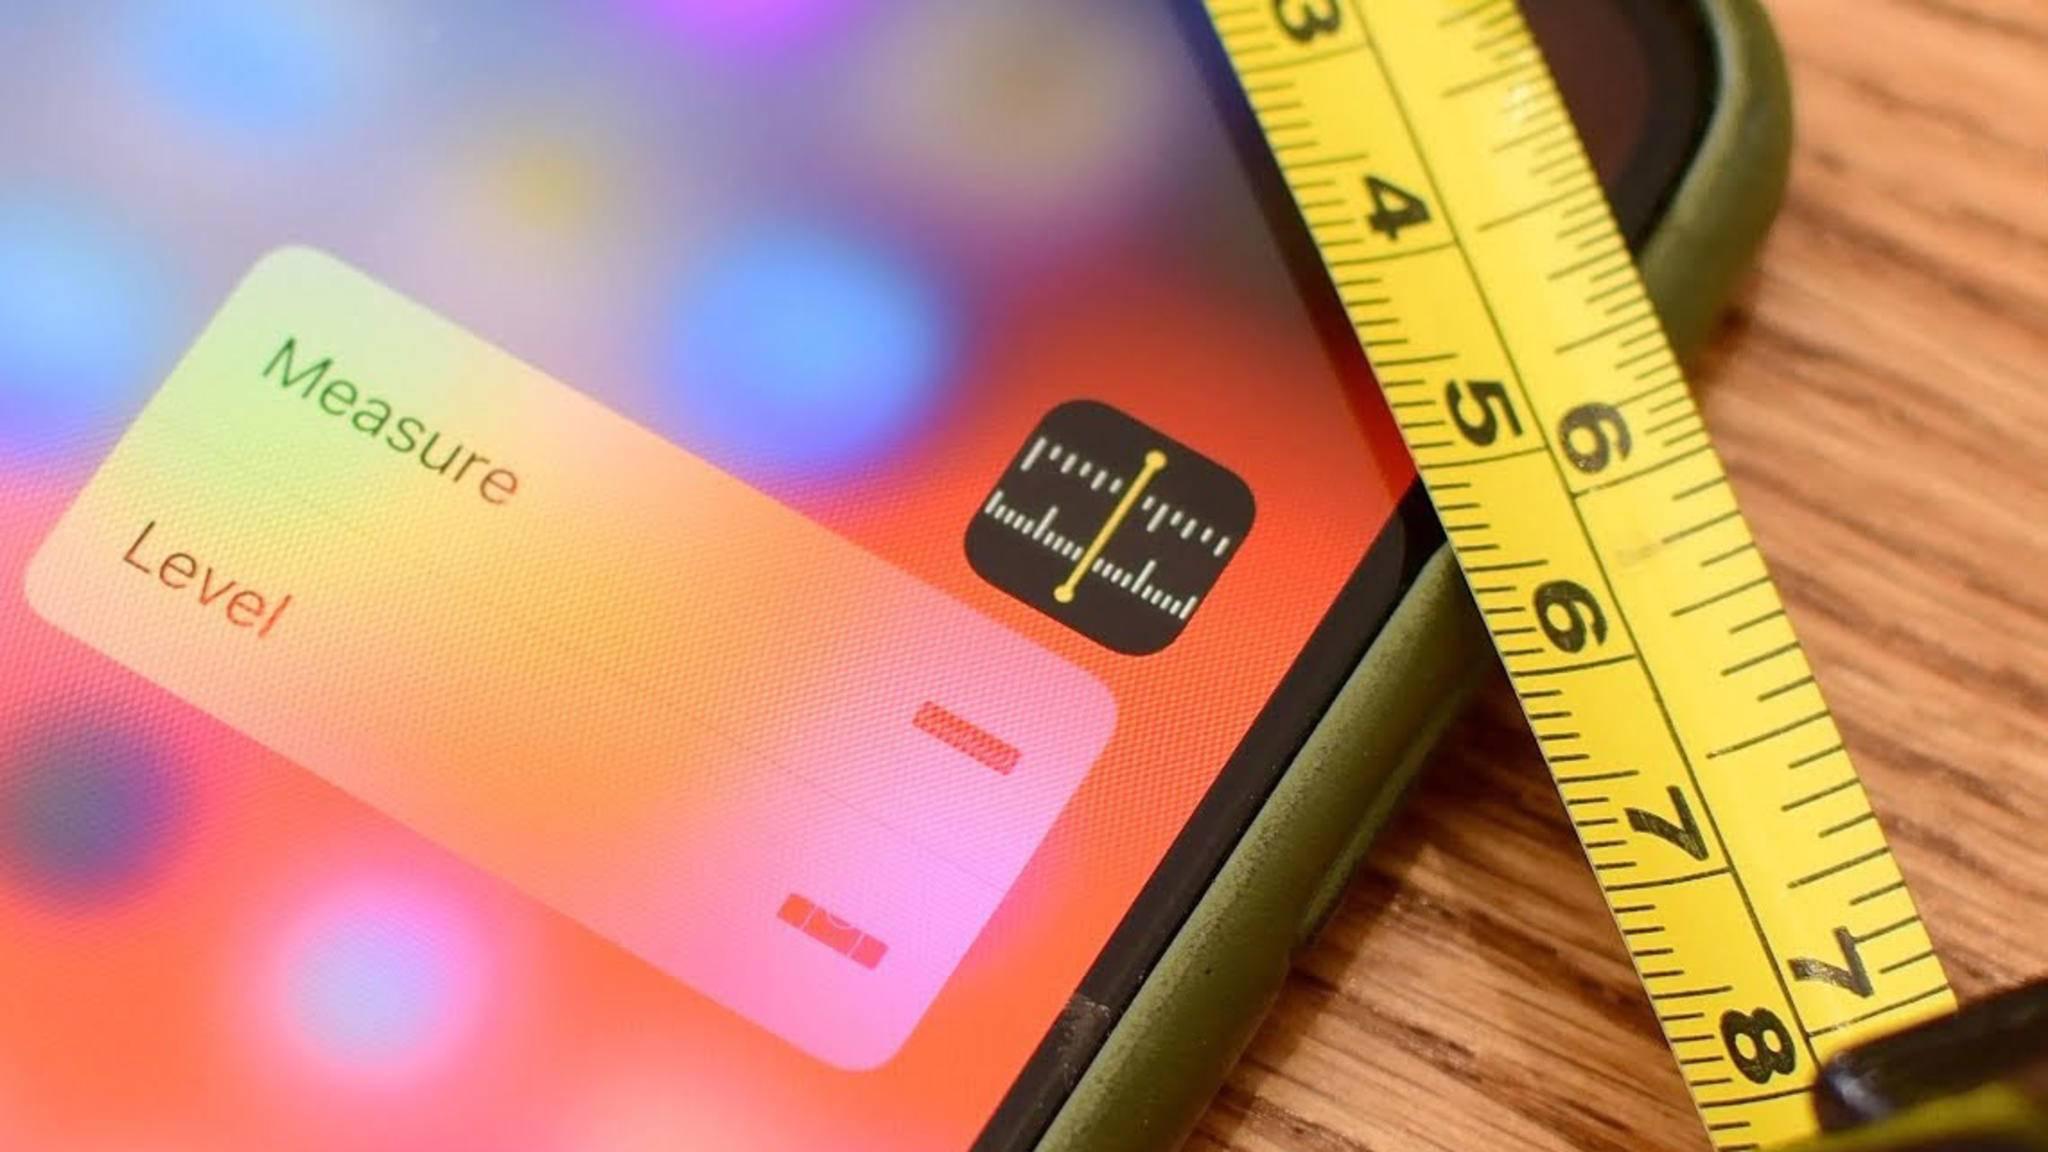 Entfernungsmesser Iphone App : So funktioniert die neue maßband app in ios